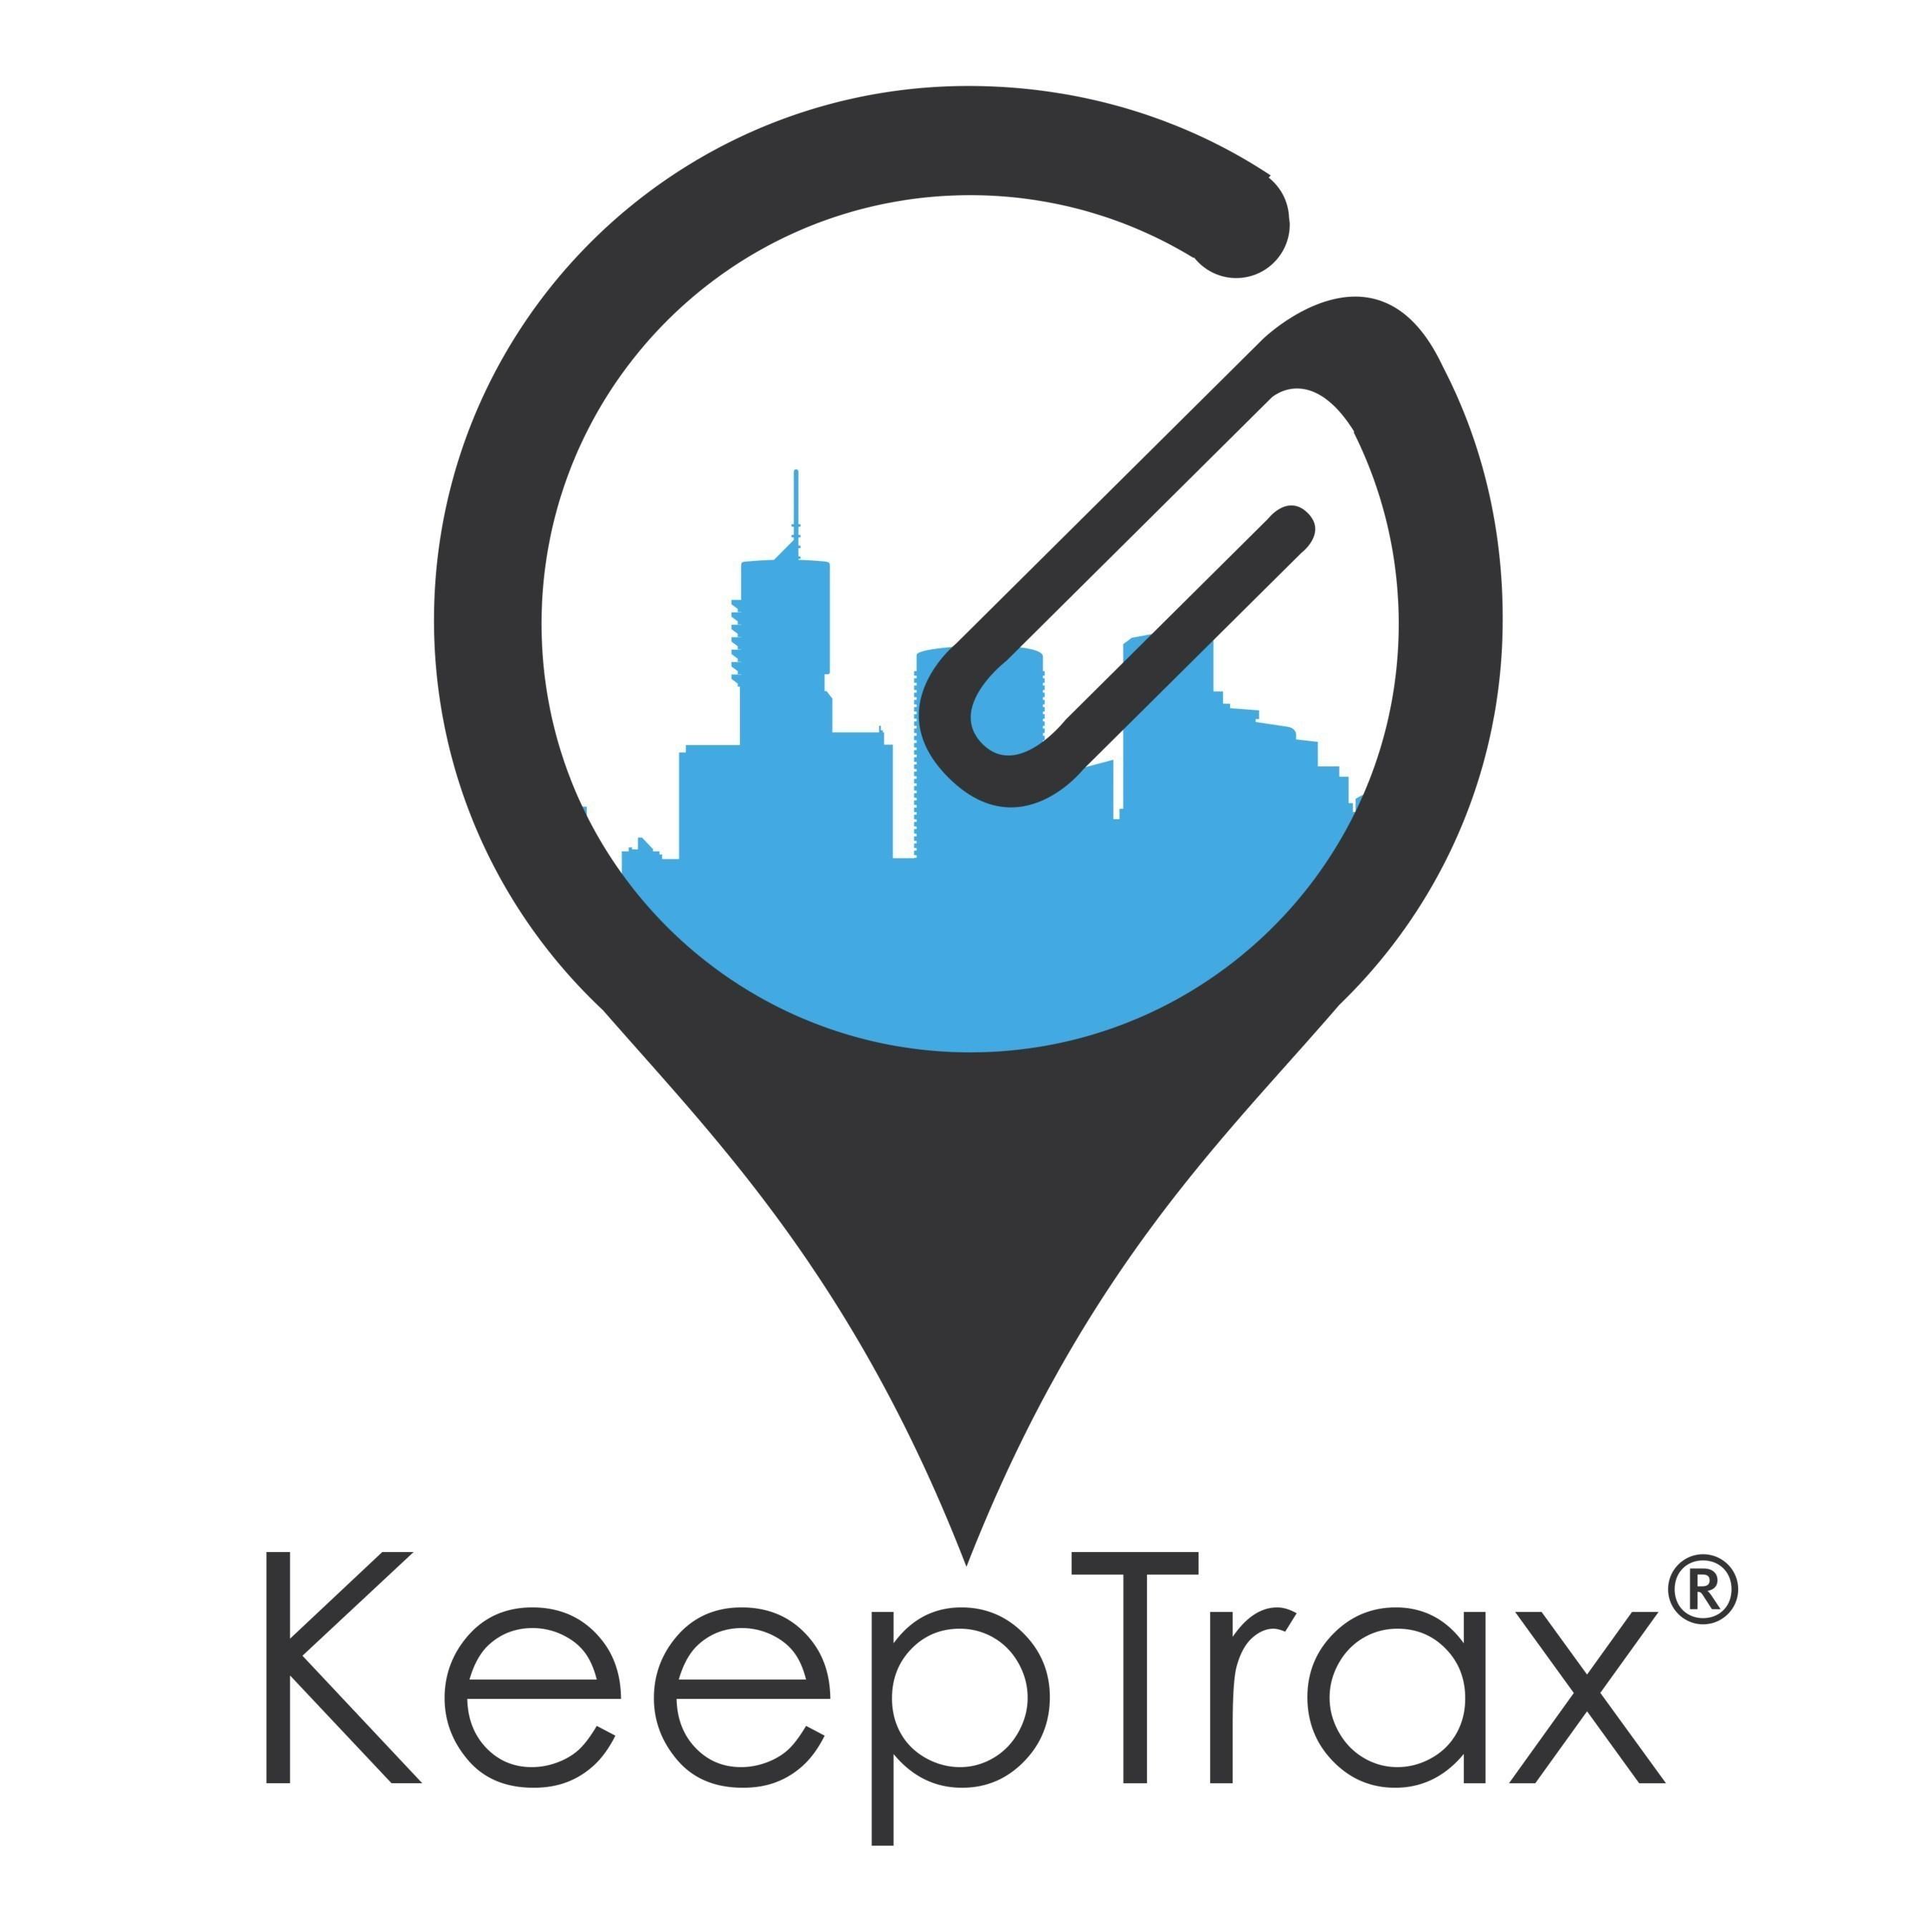 Vertical logo of KeepTrax